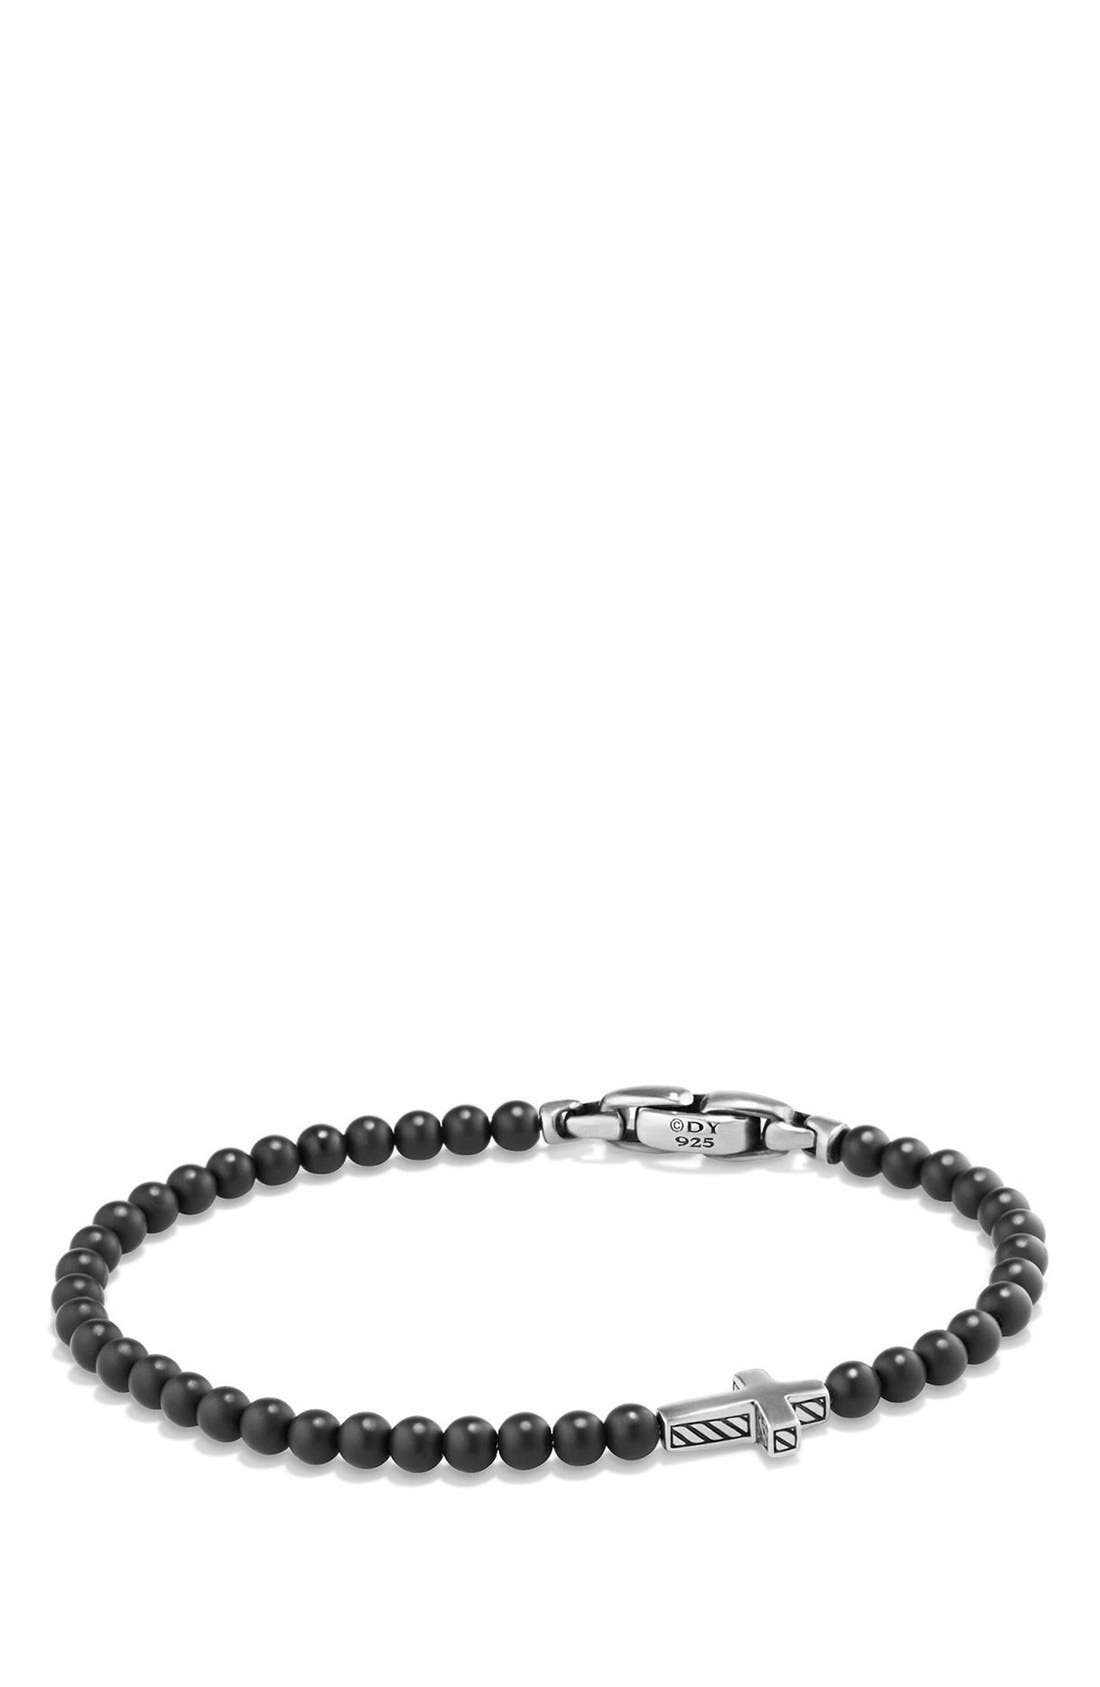 DAVID YURMAN 'Spiritual Beads' Cross Bead Bracelet with Semiprecious Stones, Main, color, SILVER/ BLACK ONYX